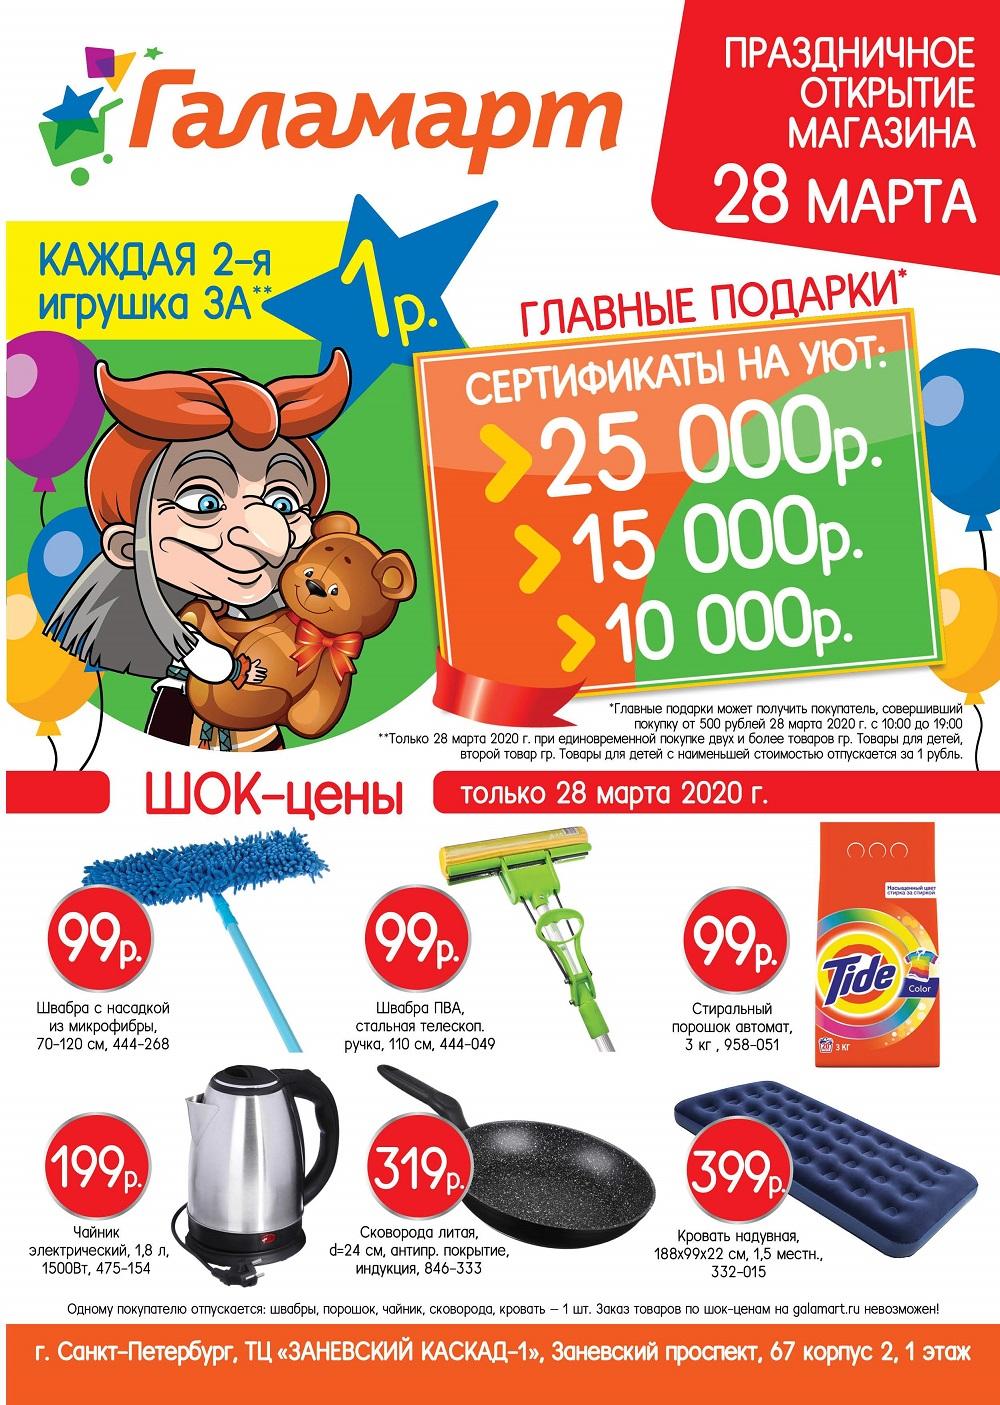 Галамарт Спб Интернет Магазин Санкт Петербург Каталог